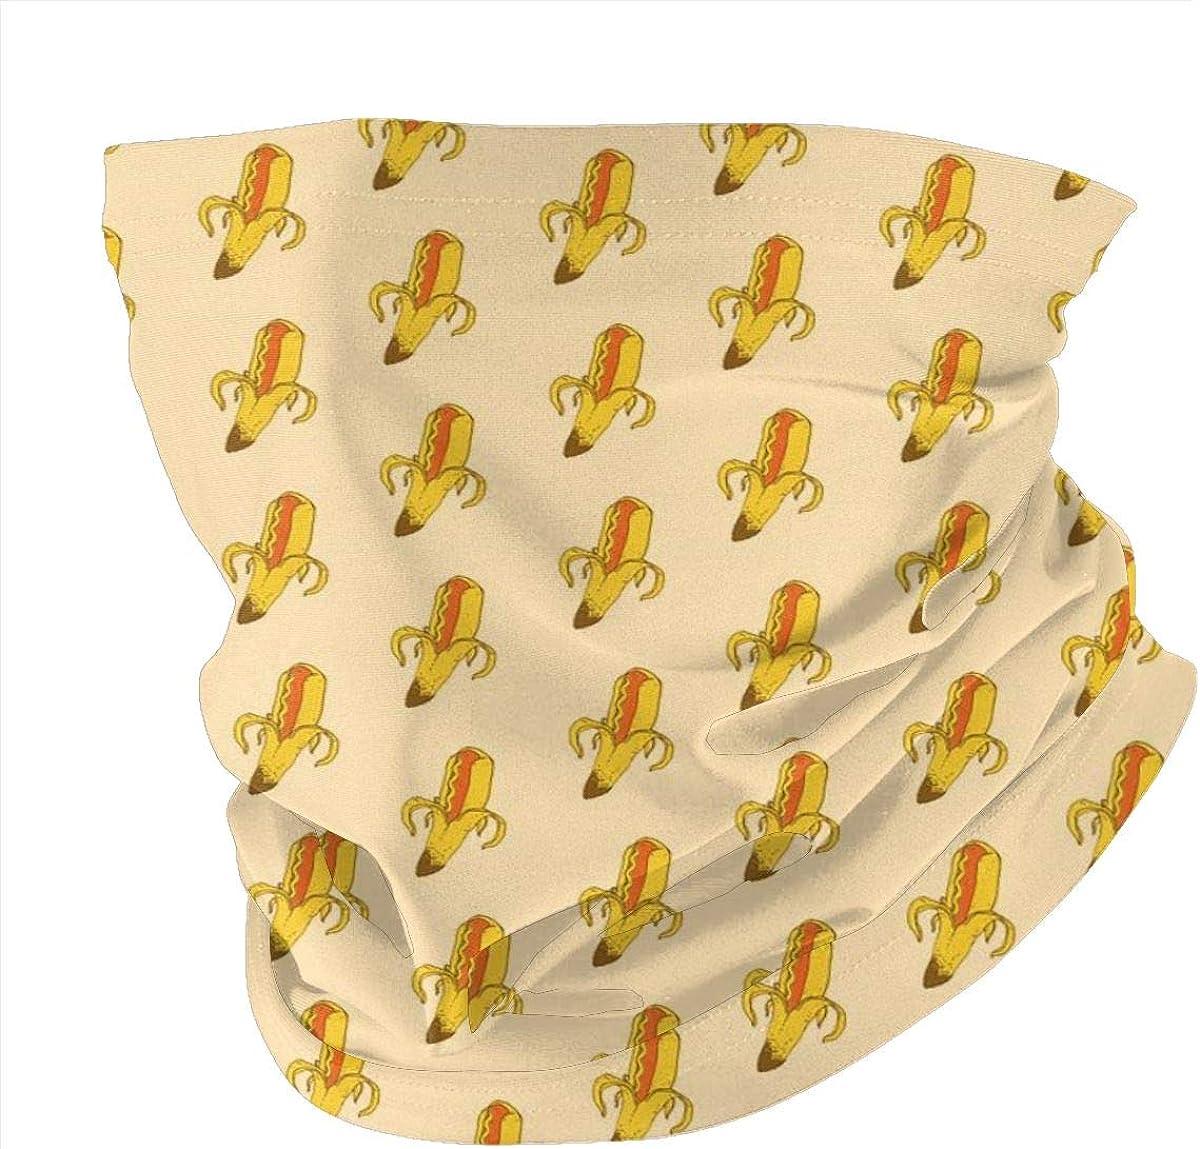 Men Woman's Seamless Scarf Balaclava Mask-Neck Gaiter Neck Cover Mask Sunscreen UV Protection for Exercise Reusable